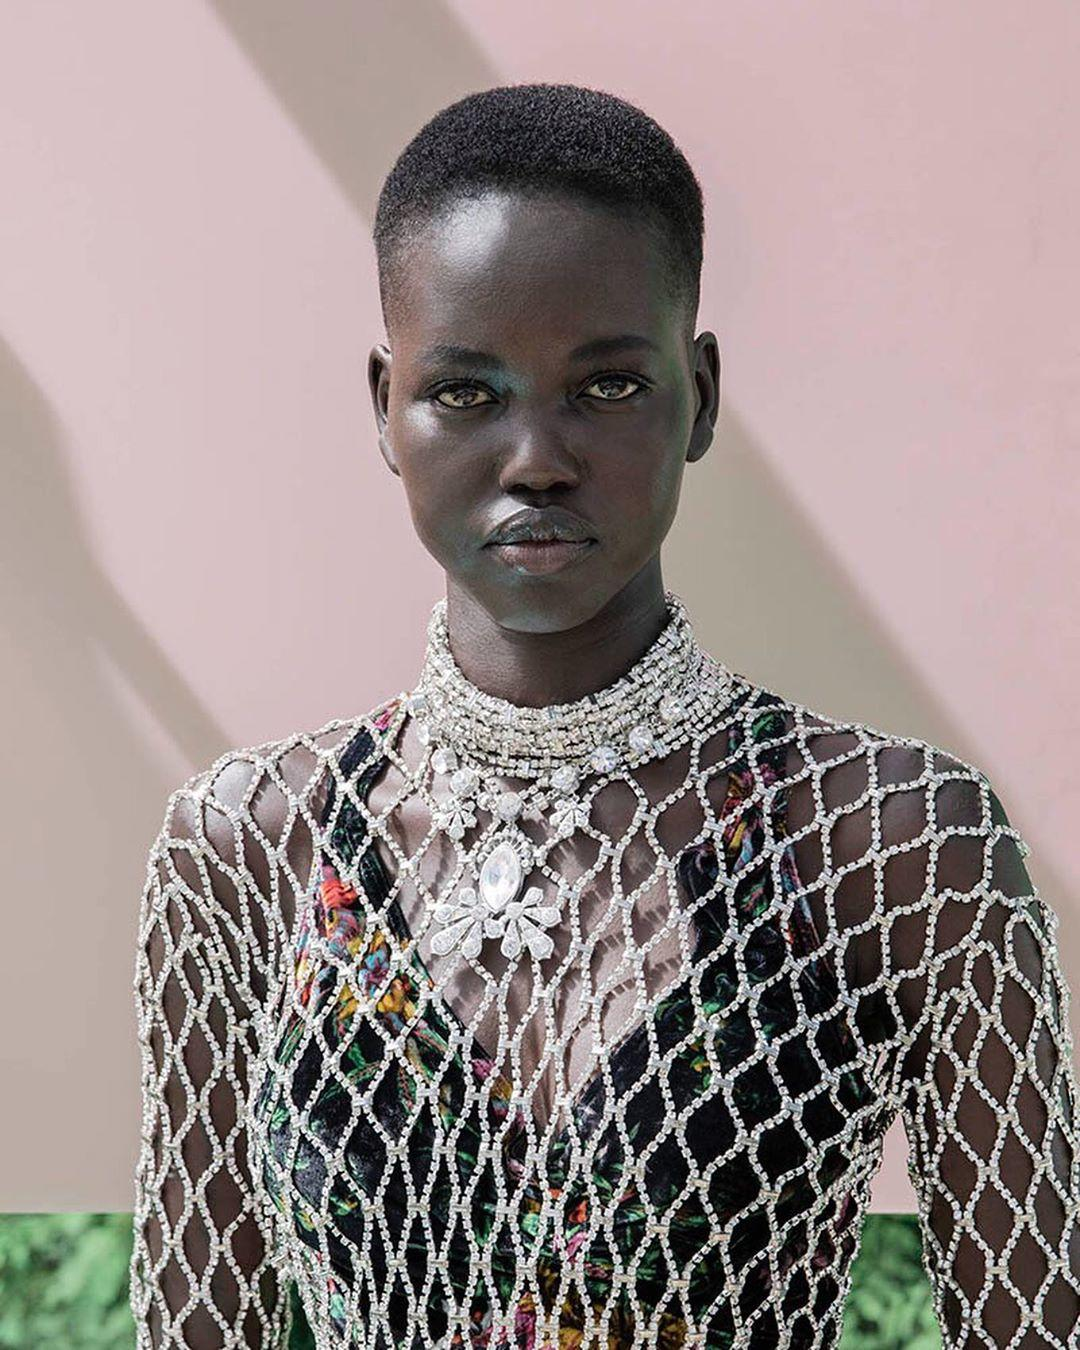 Sudanese Model Bior